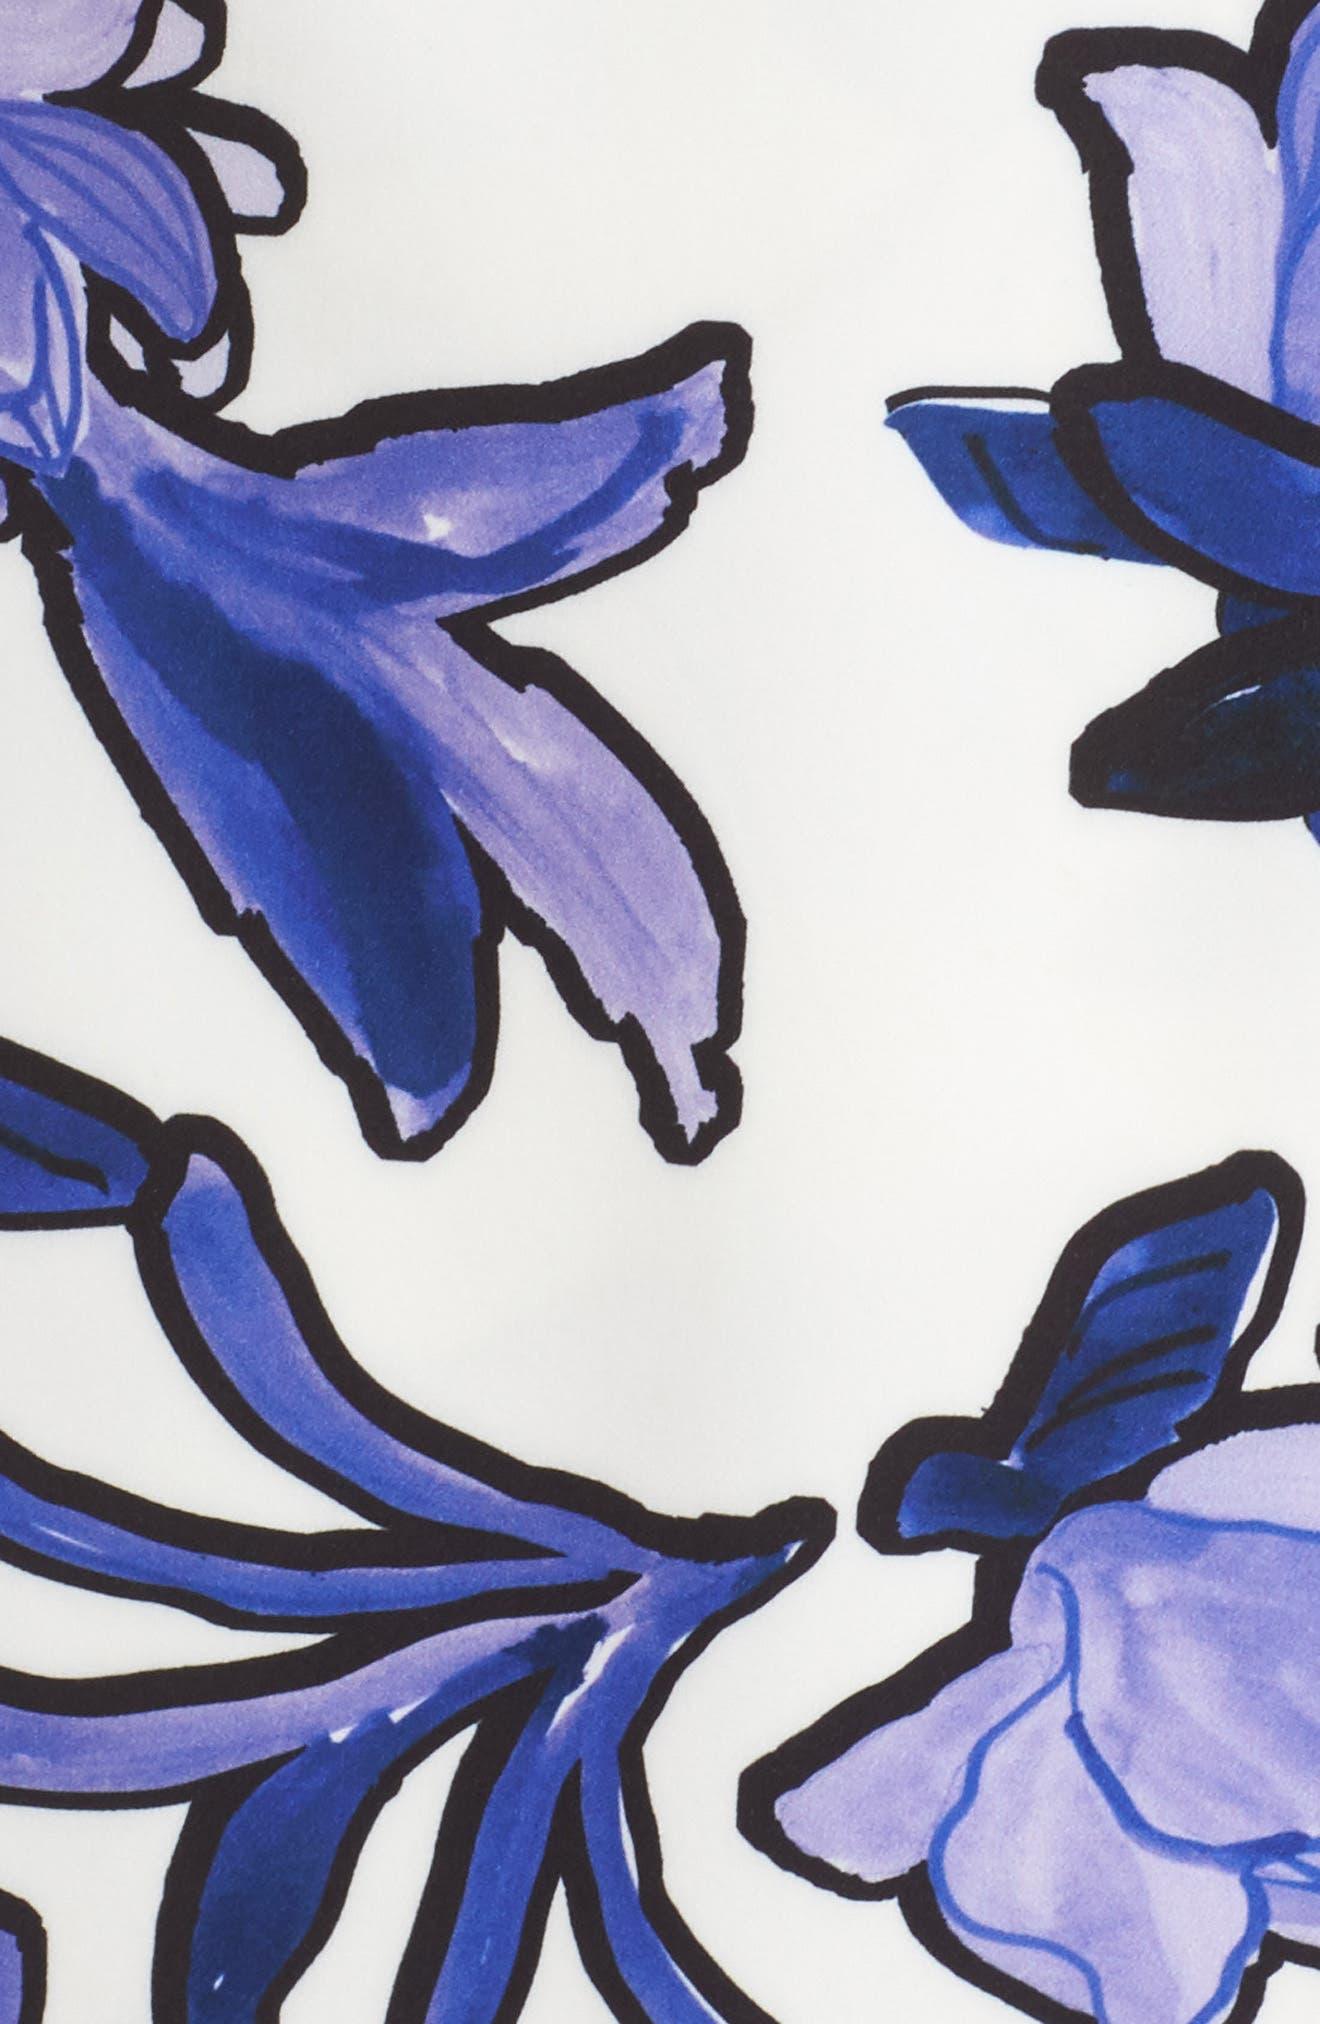 Floral Midi Dress,                             Alternate thumbnail 5, color,                             Ivory Painted Iris Floral